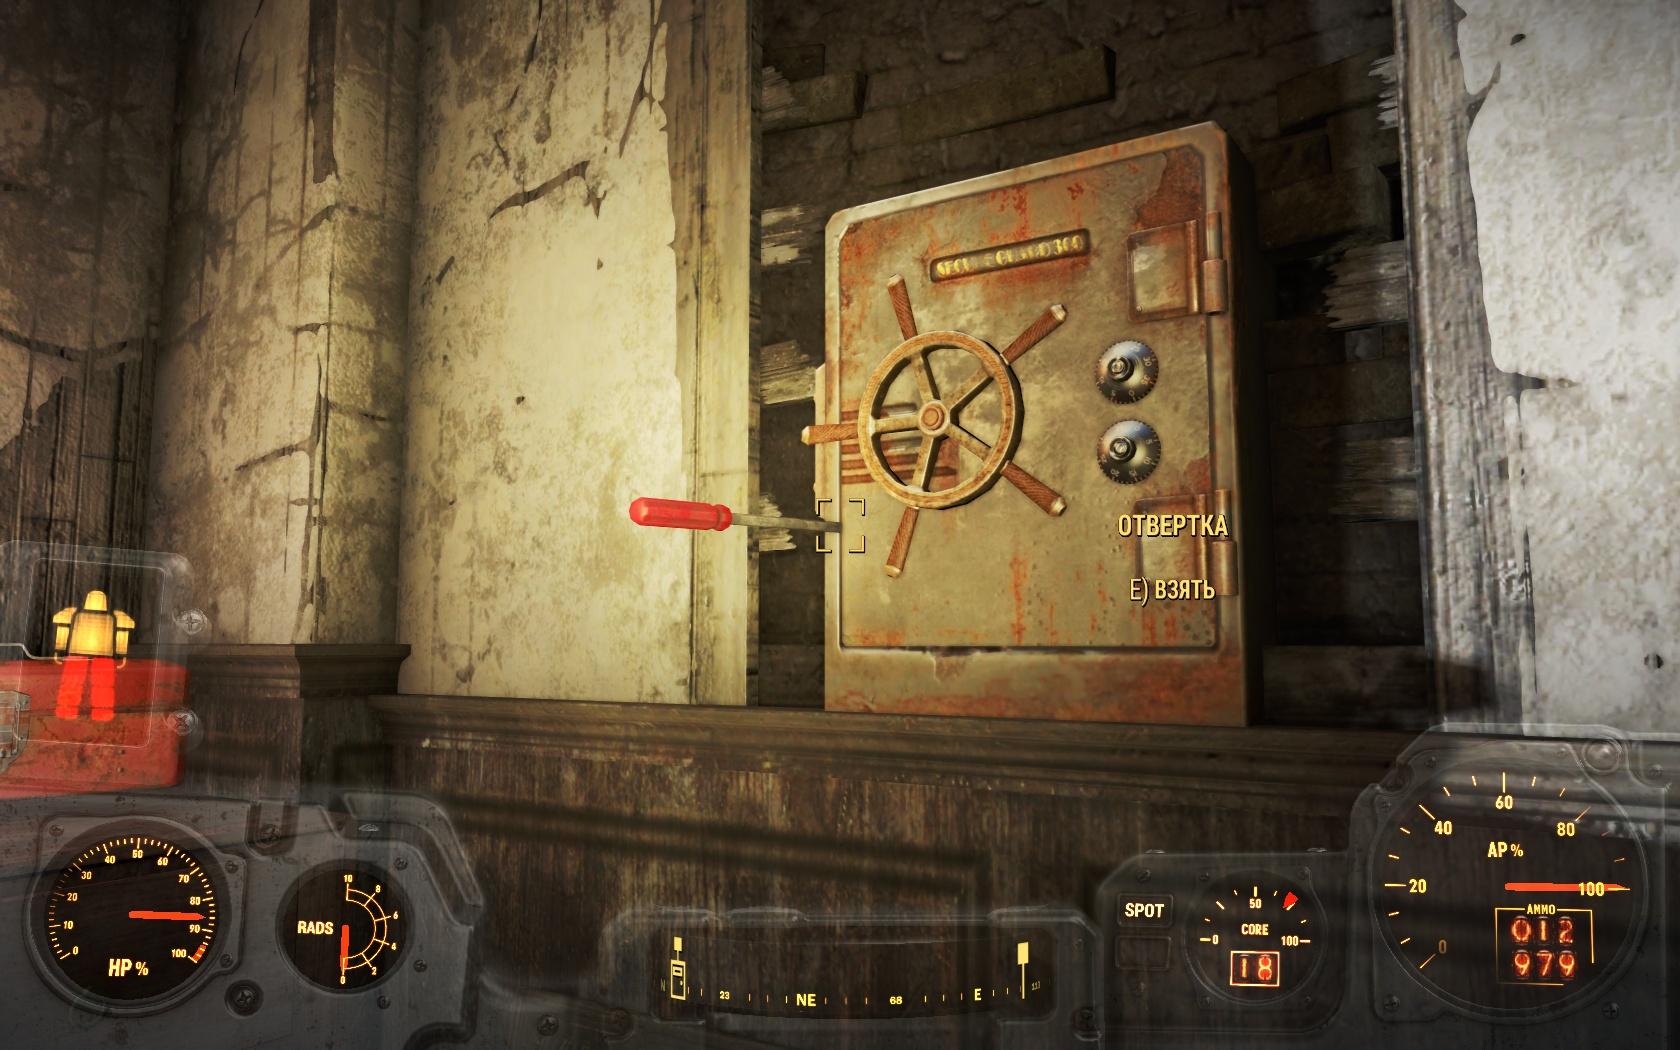 Попытка взлома (Бар Клевер) - Fallout 4 Бар Клевер, Сейф